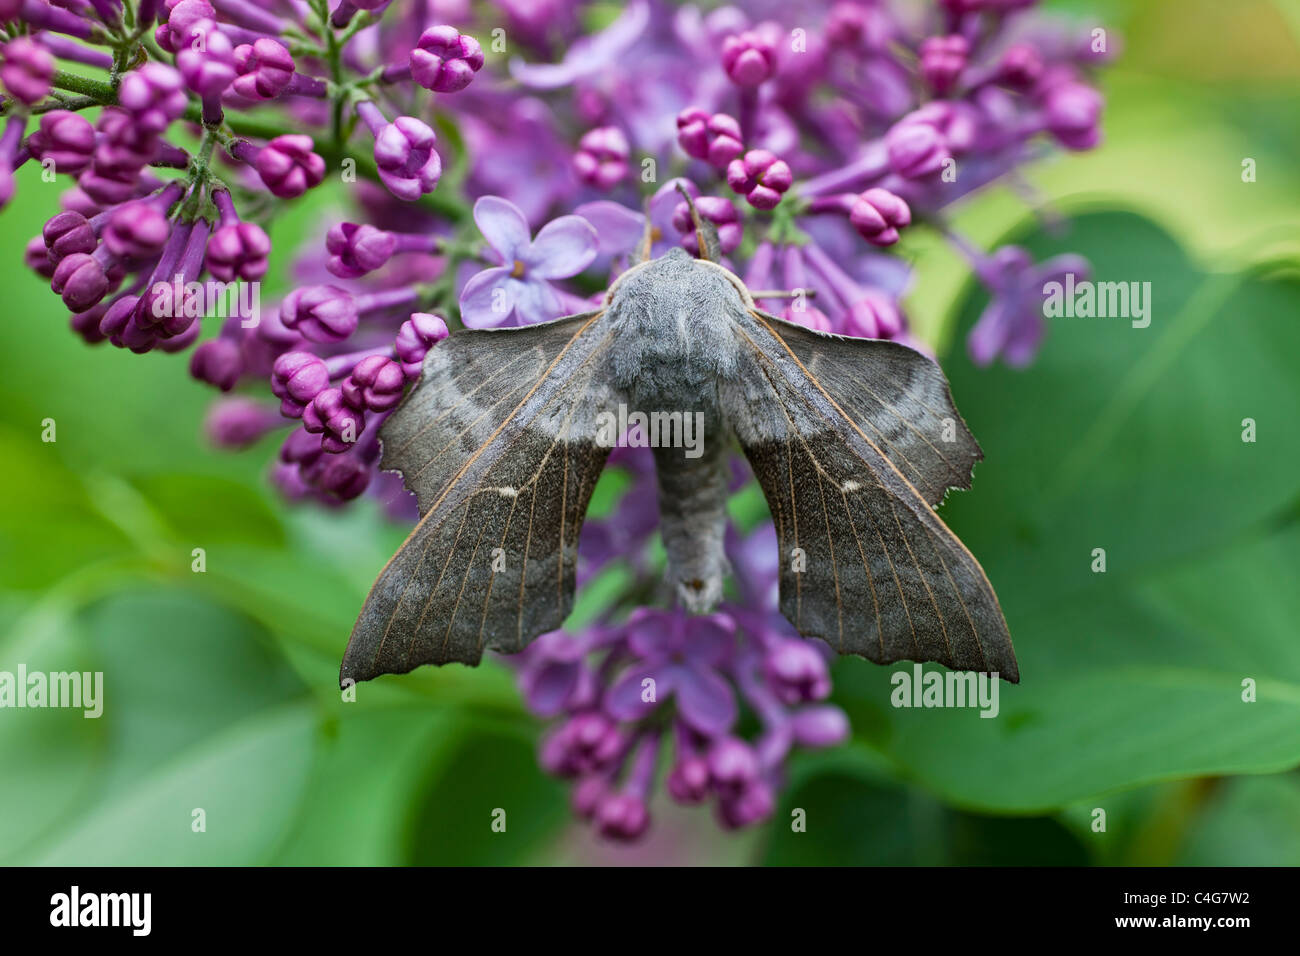 Poplar Hawkmoth (Laothoe populi), resting on lilac flowers in garden, Lower Saxony, Germany Stock Photo